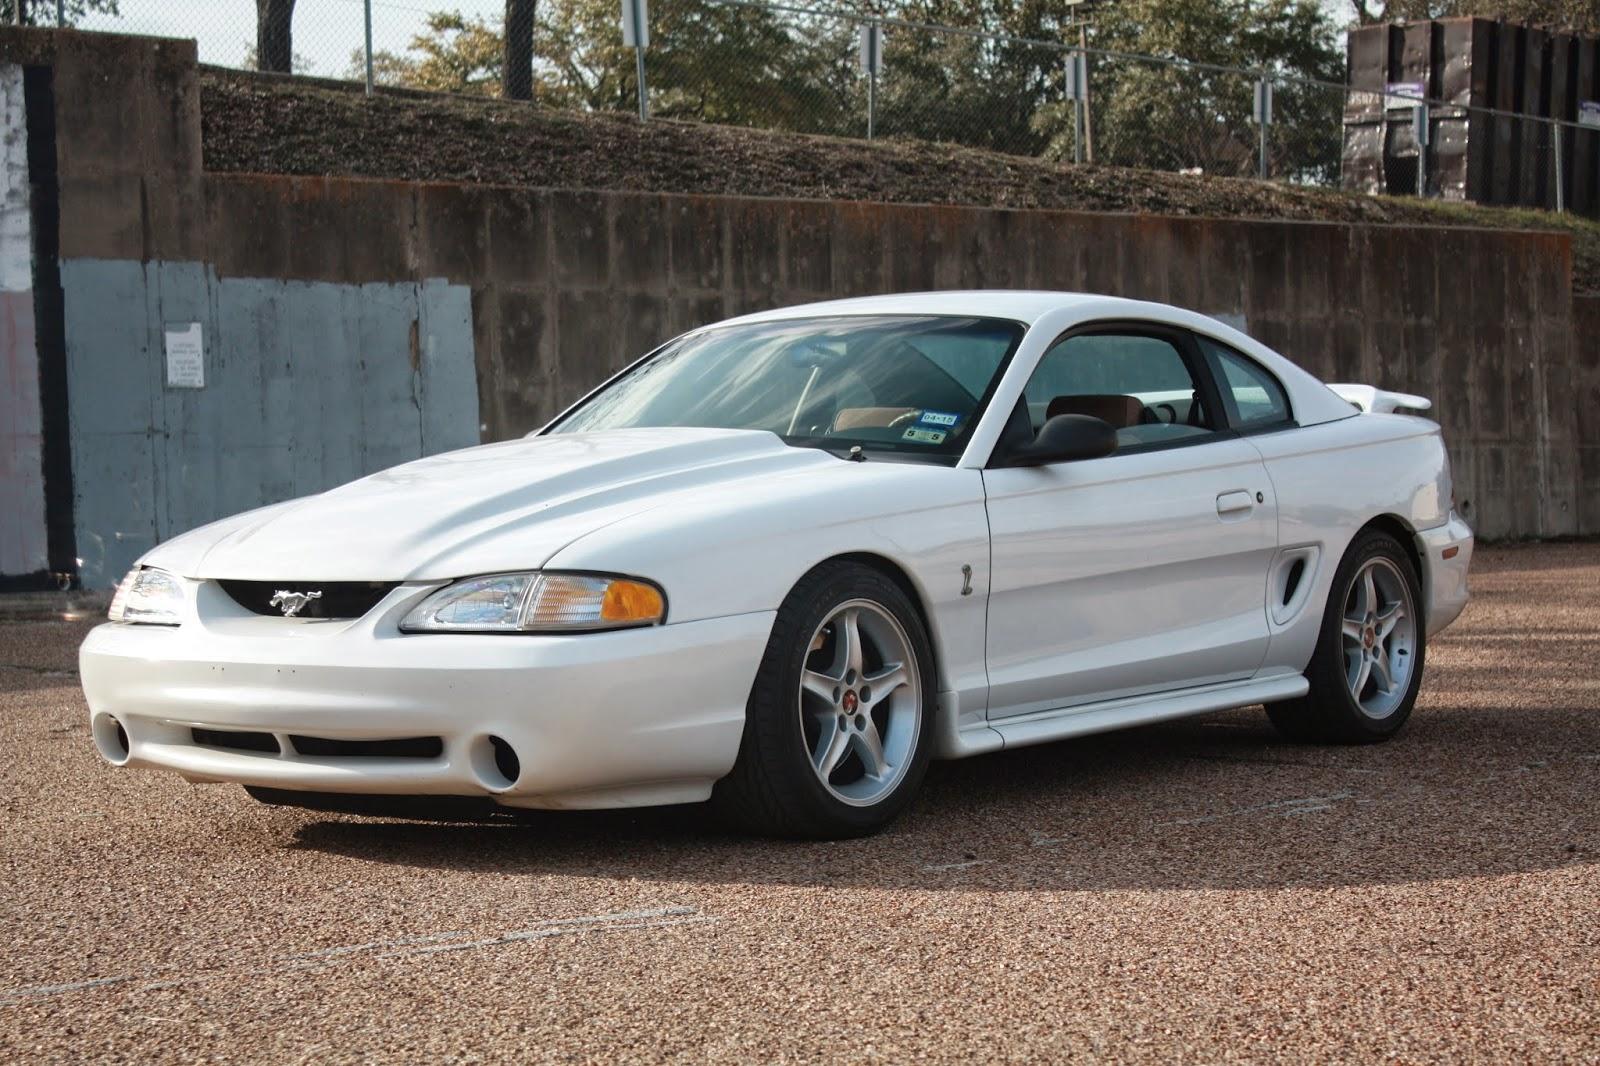 Whiteboy S Mustangs 1995 Mustang Cobra R